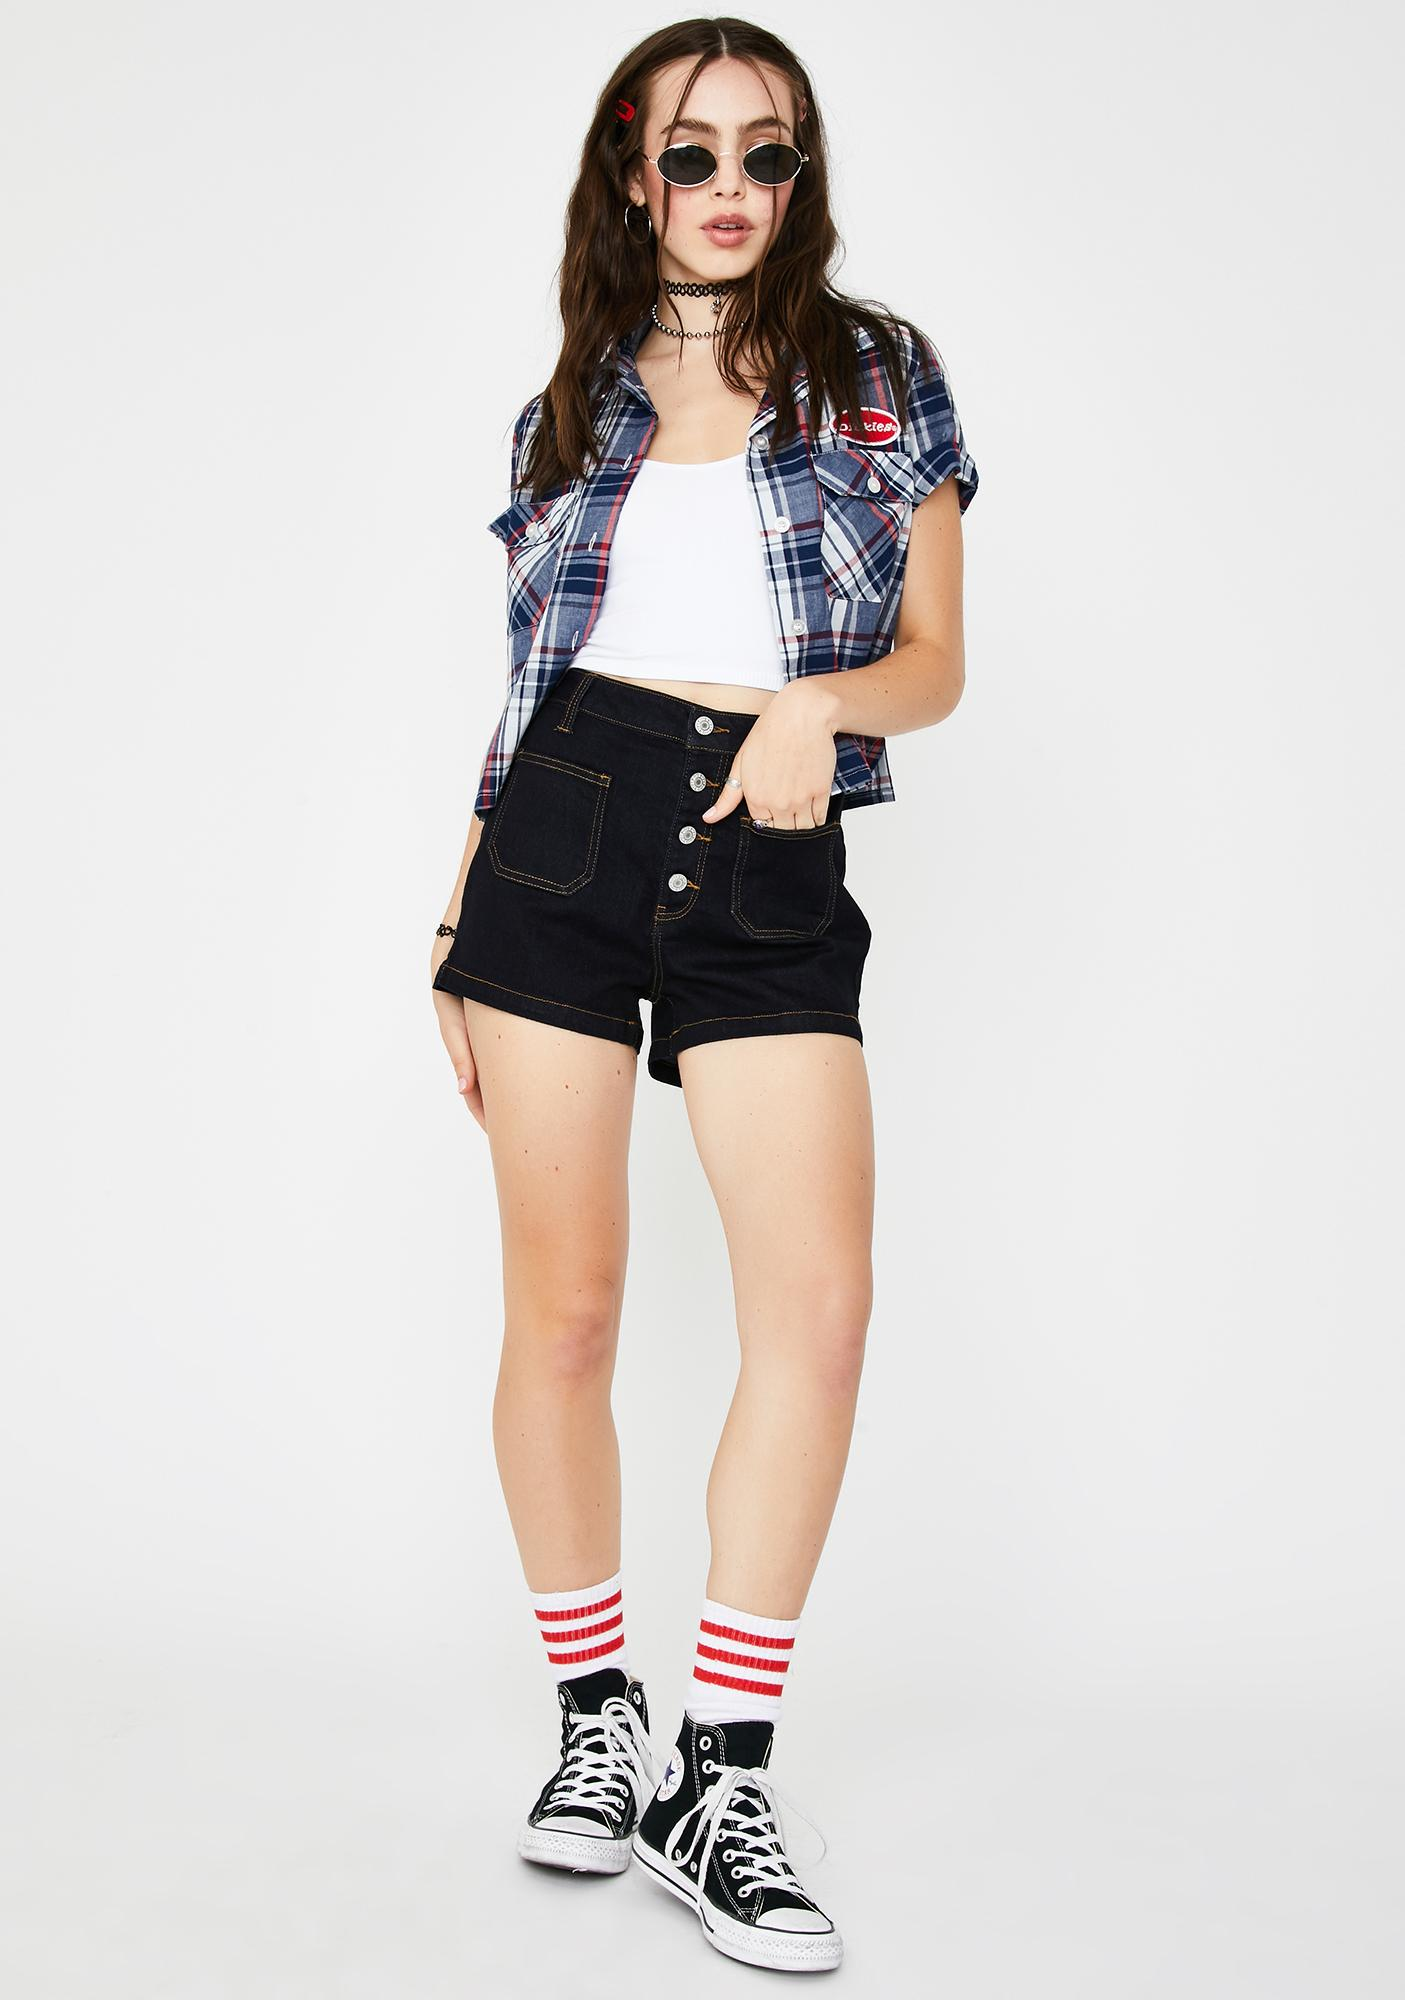 Dickies Girl Rinse Wash Exposed Button Denim Shorts